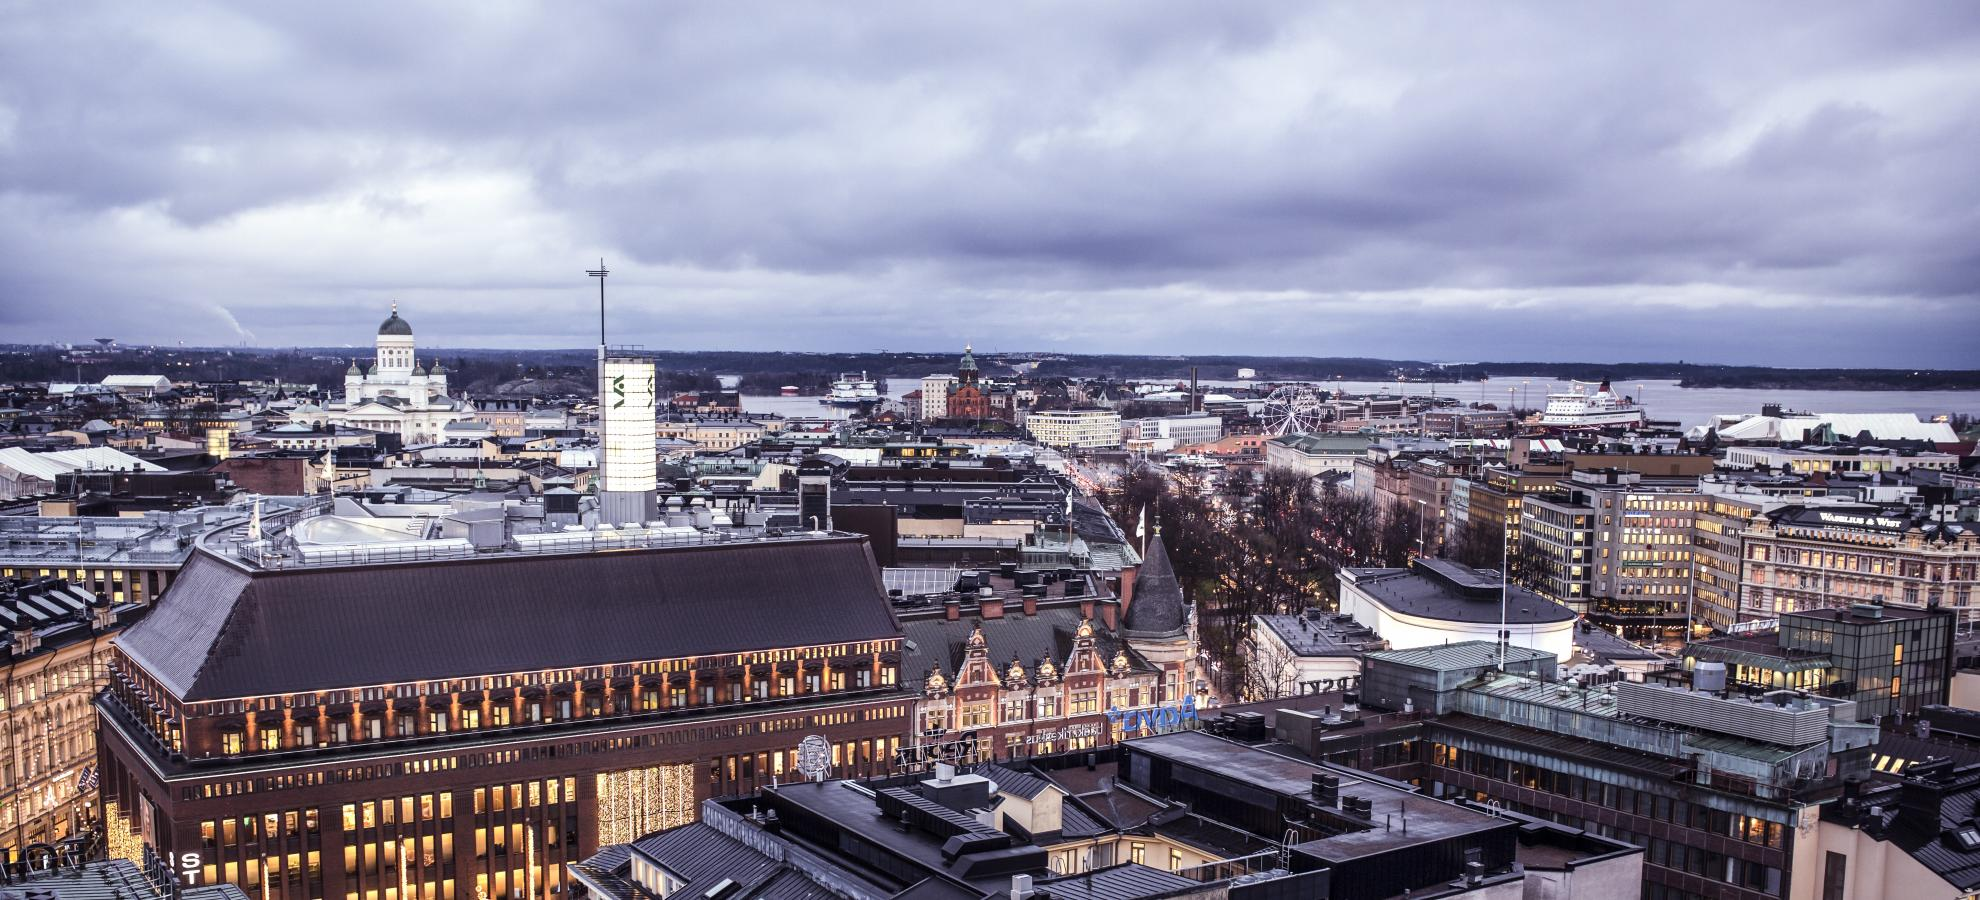 Modernismul finlandez - [DOCX Document]